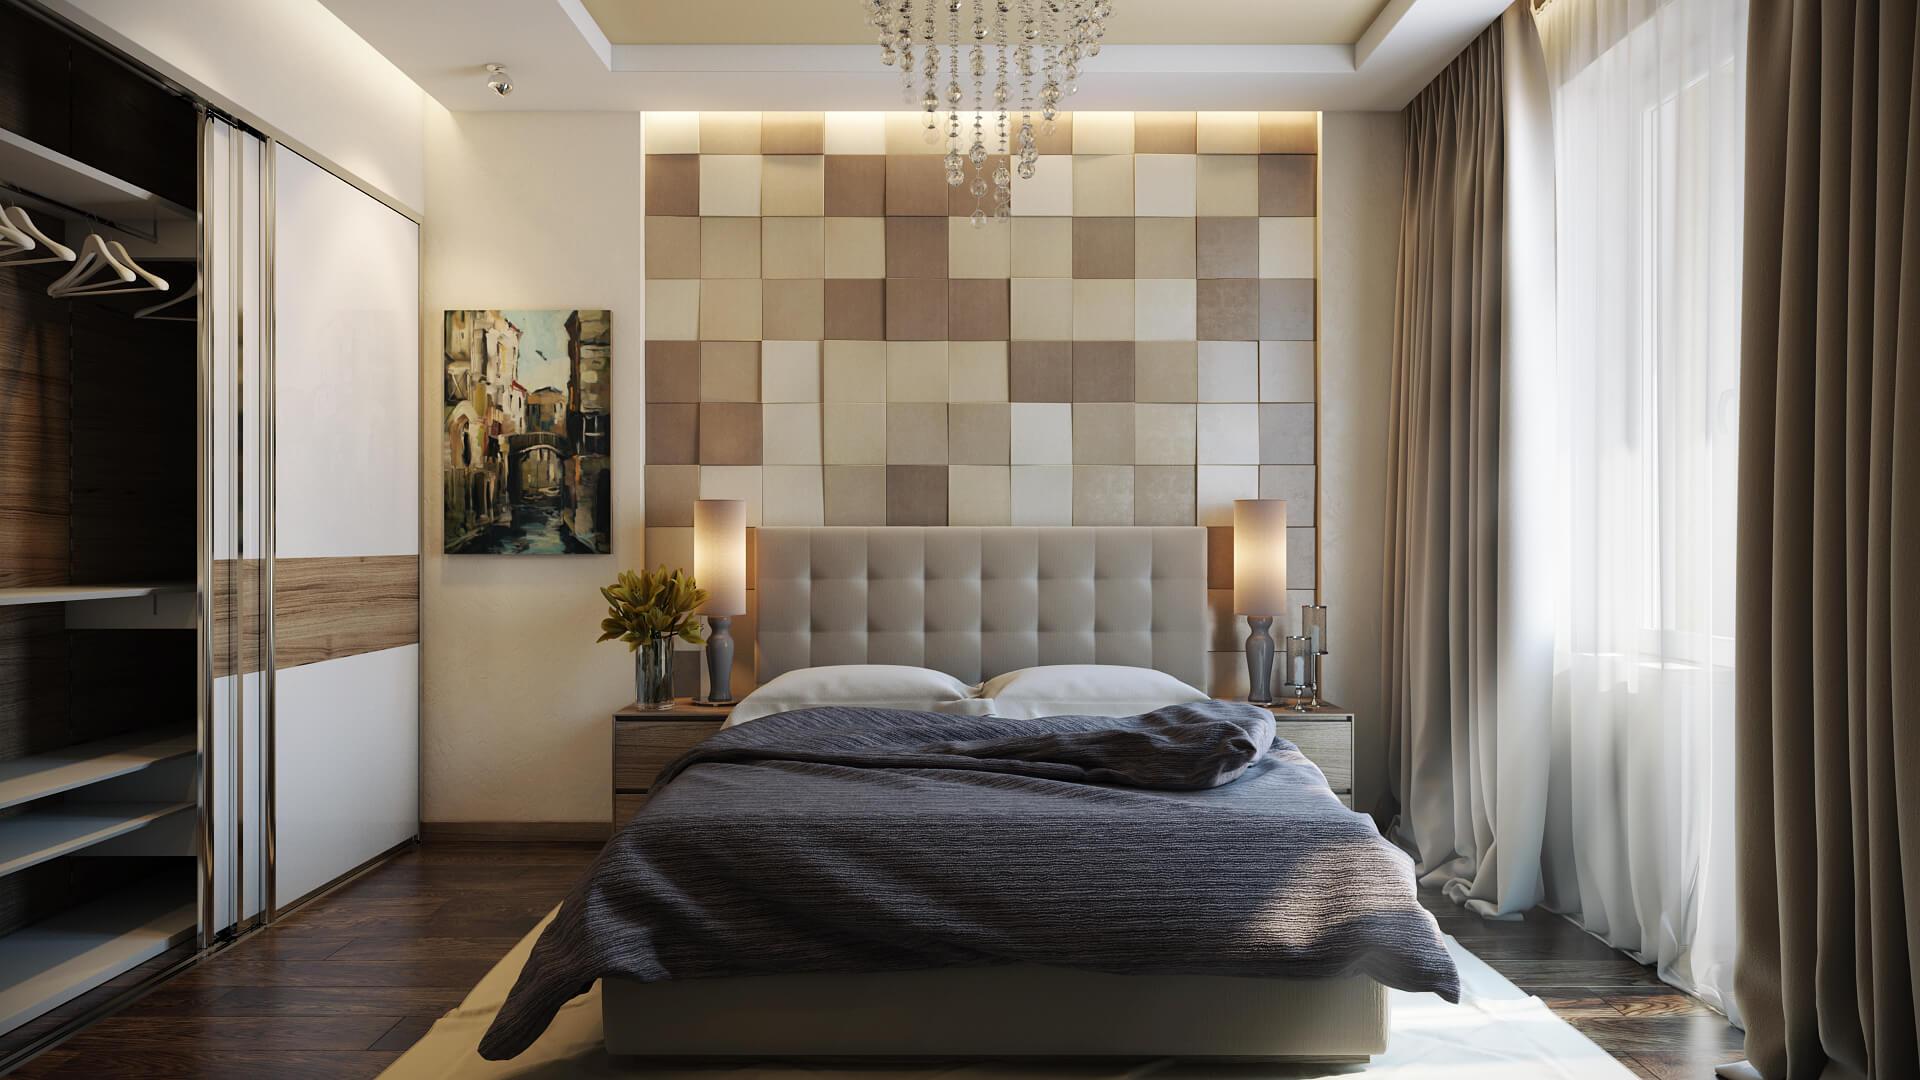 bedroom with wooden wall in headboard design